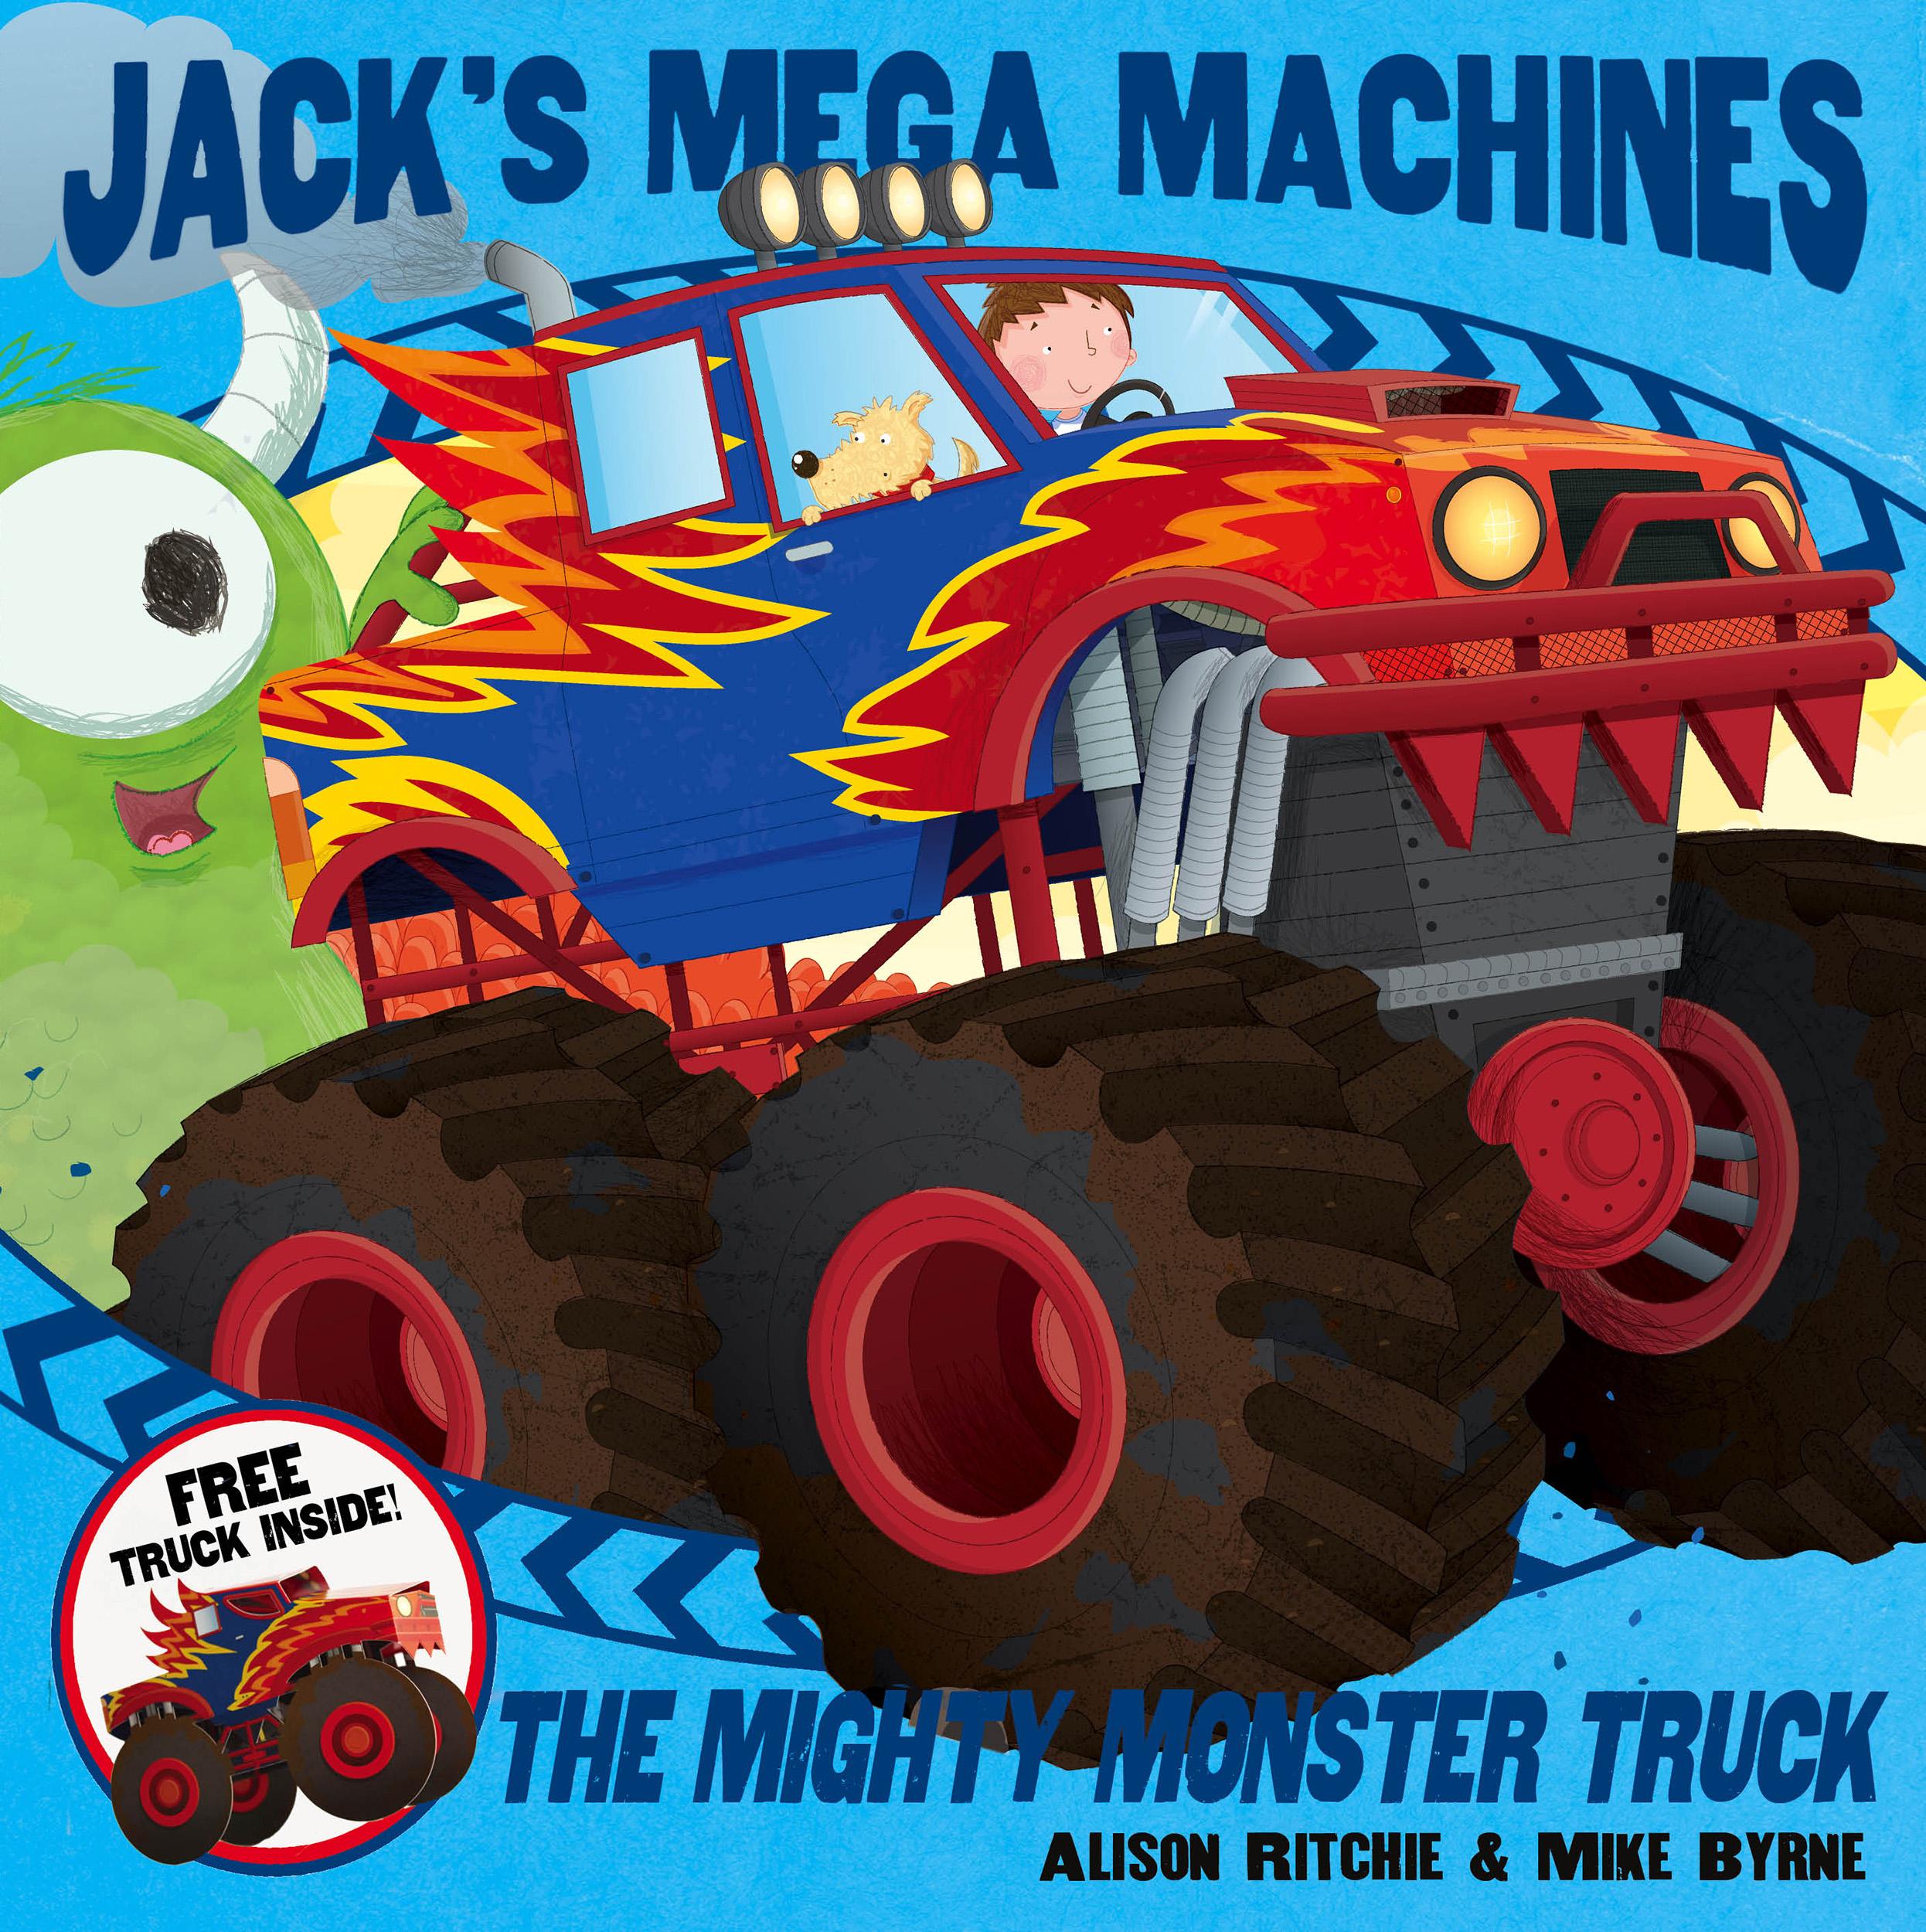 Jacks mega machines mighty monster truck 9780857075703 hr